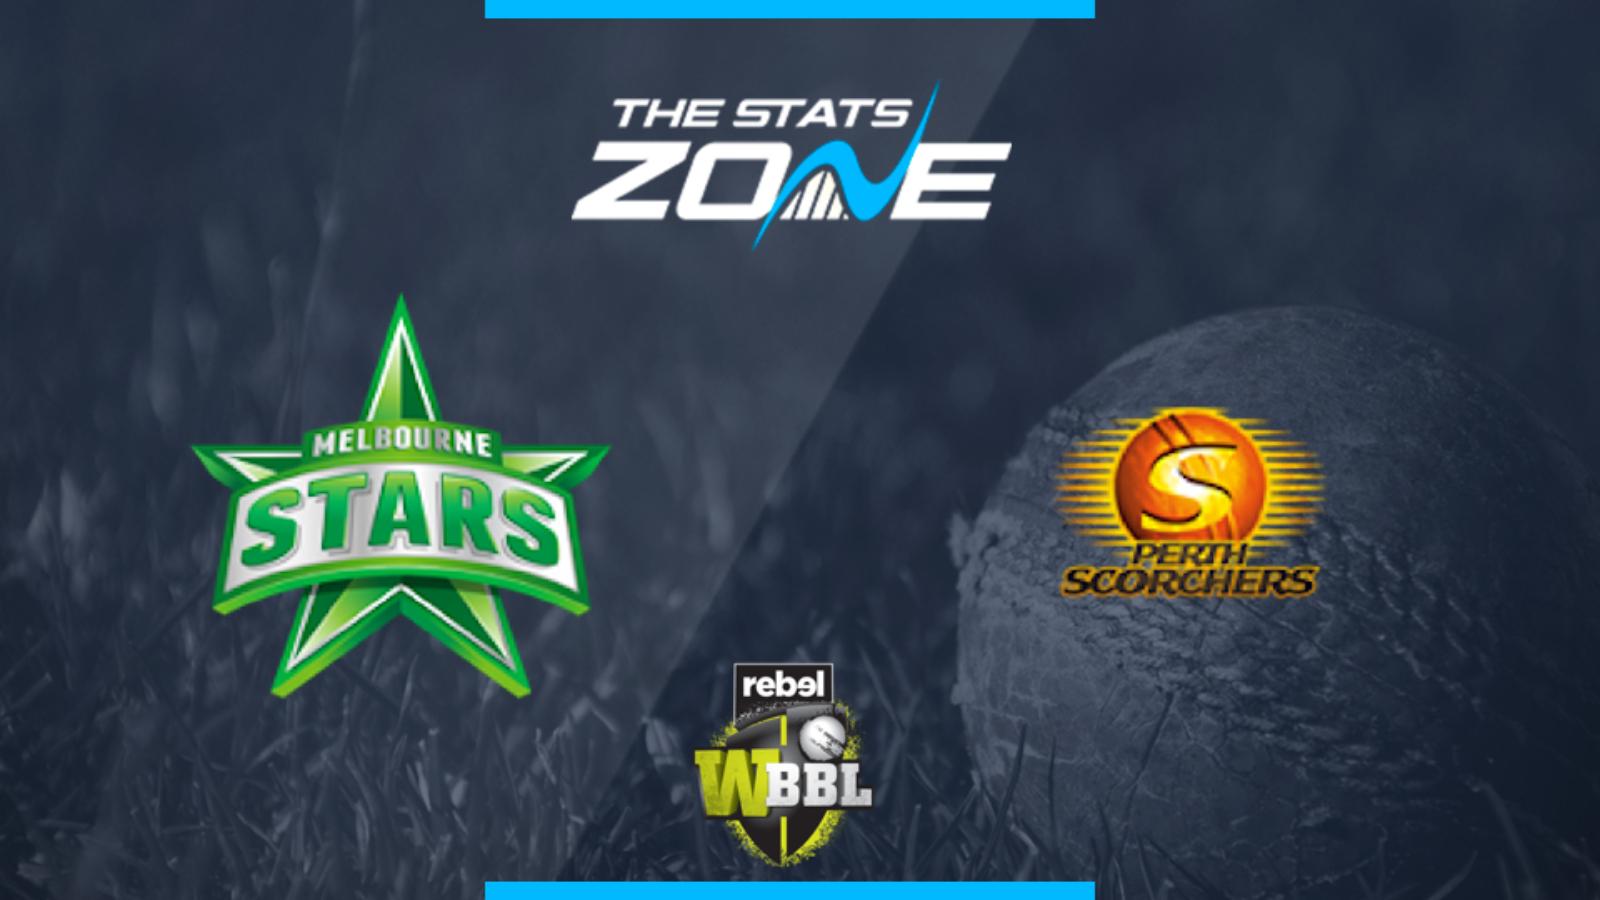 2019 Women's Big Bash League – Melbourne Stars Women vs Perth Scorchers Women Preview & Prediction - The Stats Zone